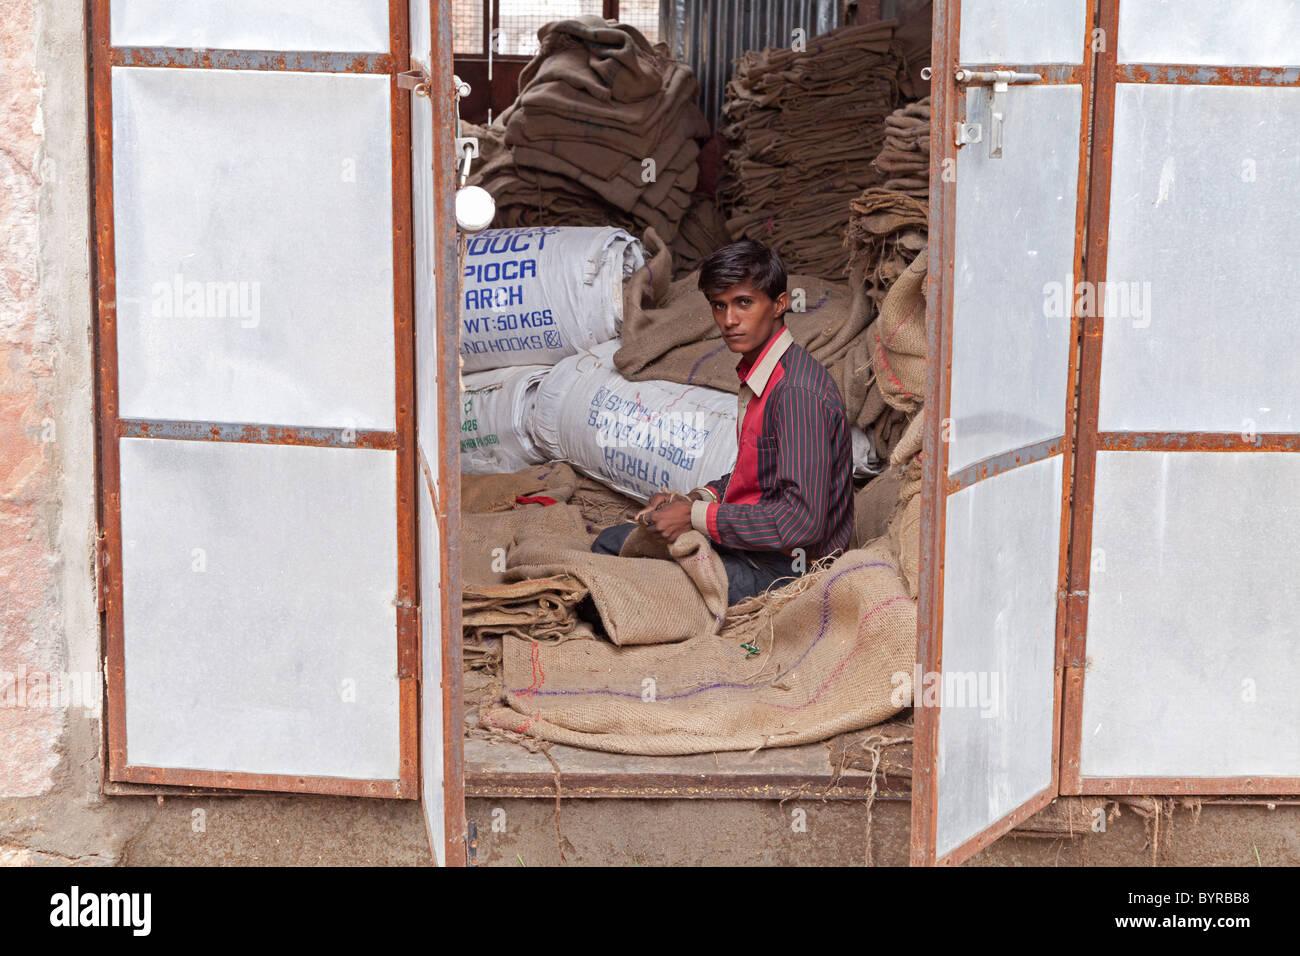 India, Rajasthan, jodhpur young man repairing hessian sacks framed by metal shutters - Stock Image